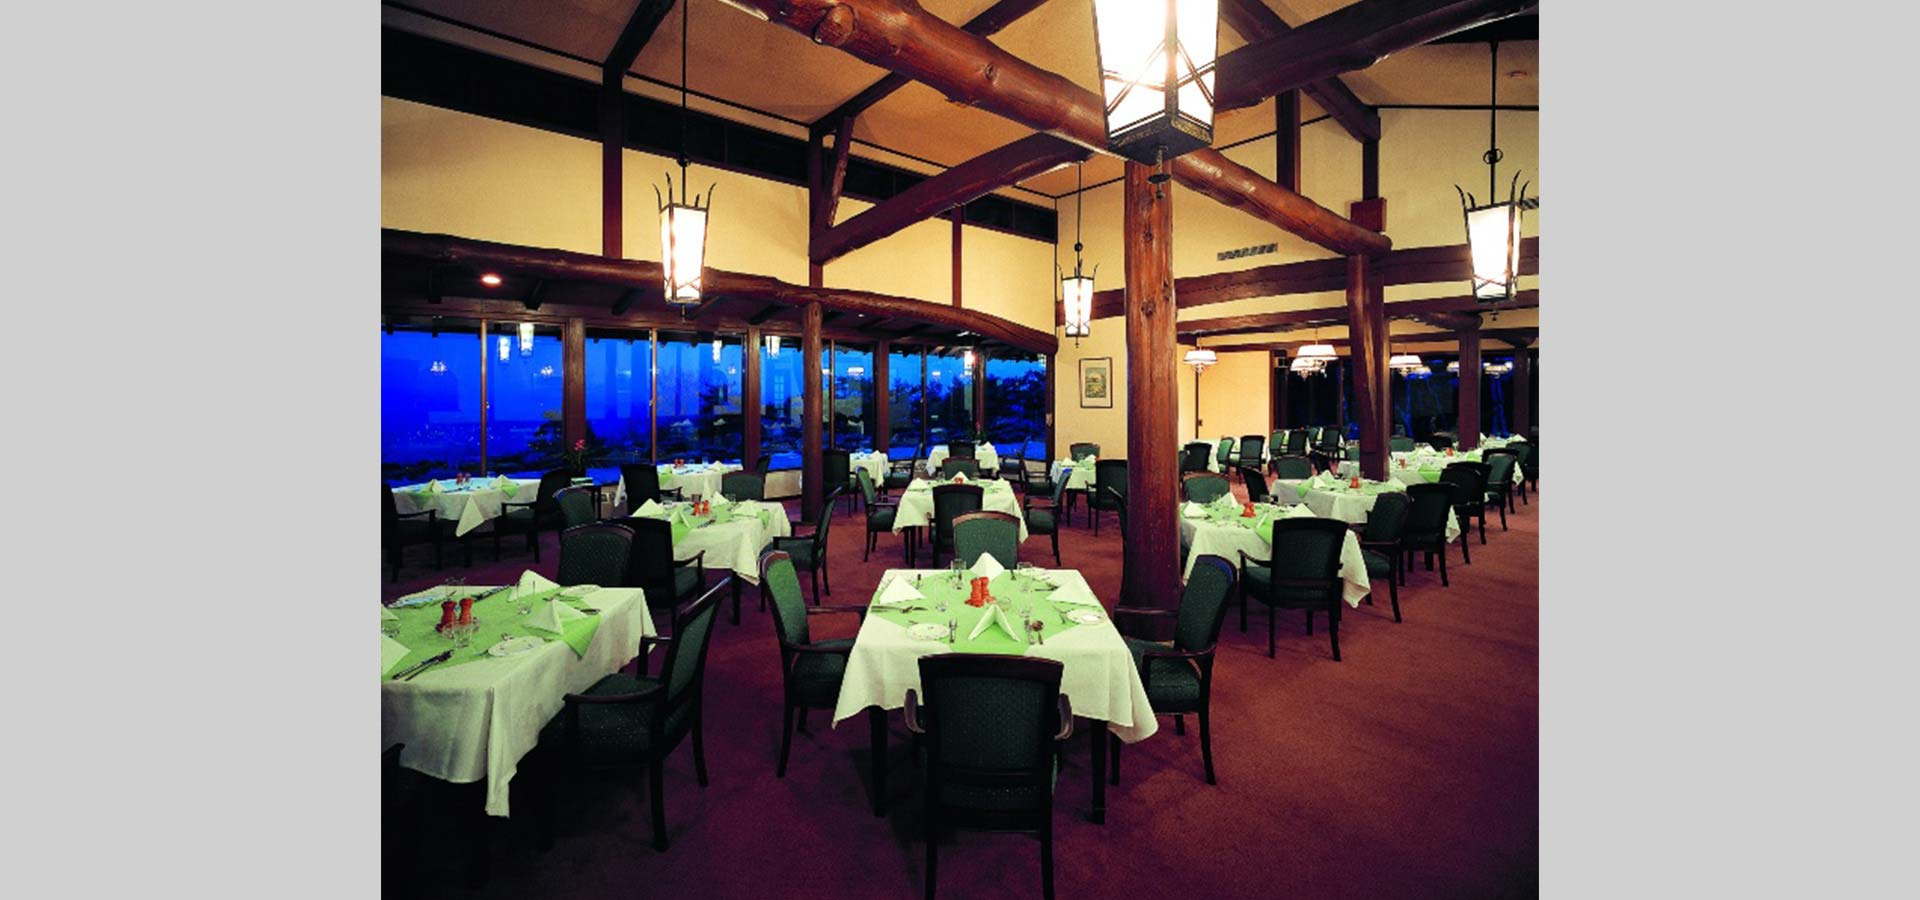 Hotel Restaurant Western And Japanese Cuisine Tsumagoi